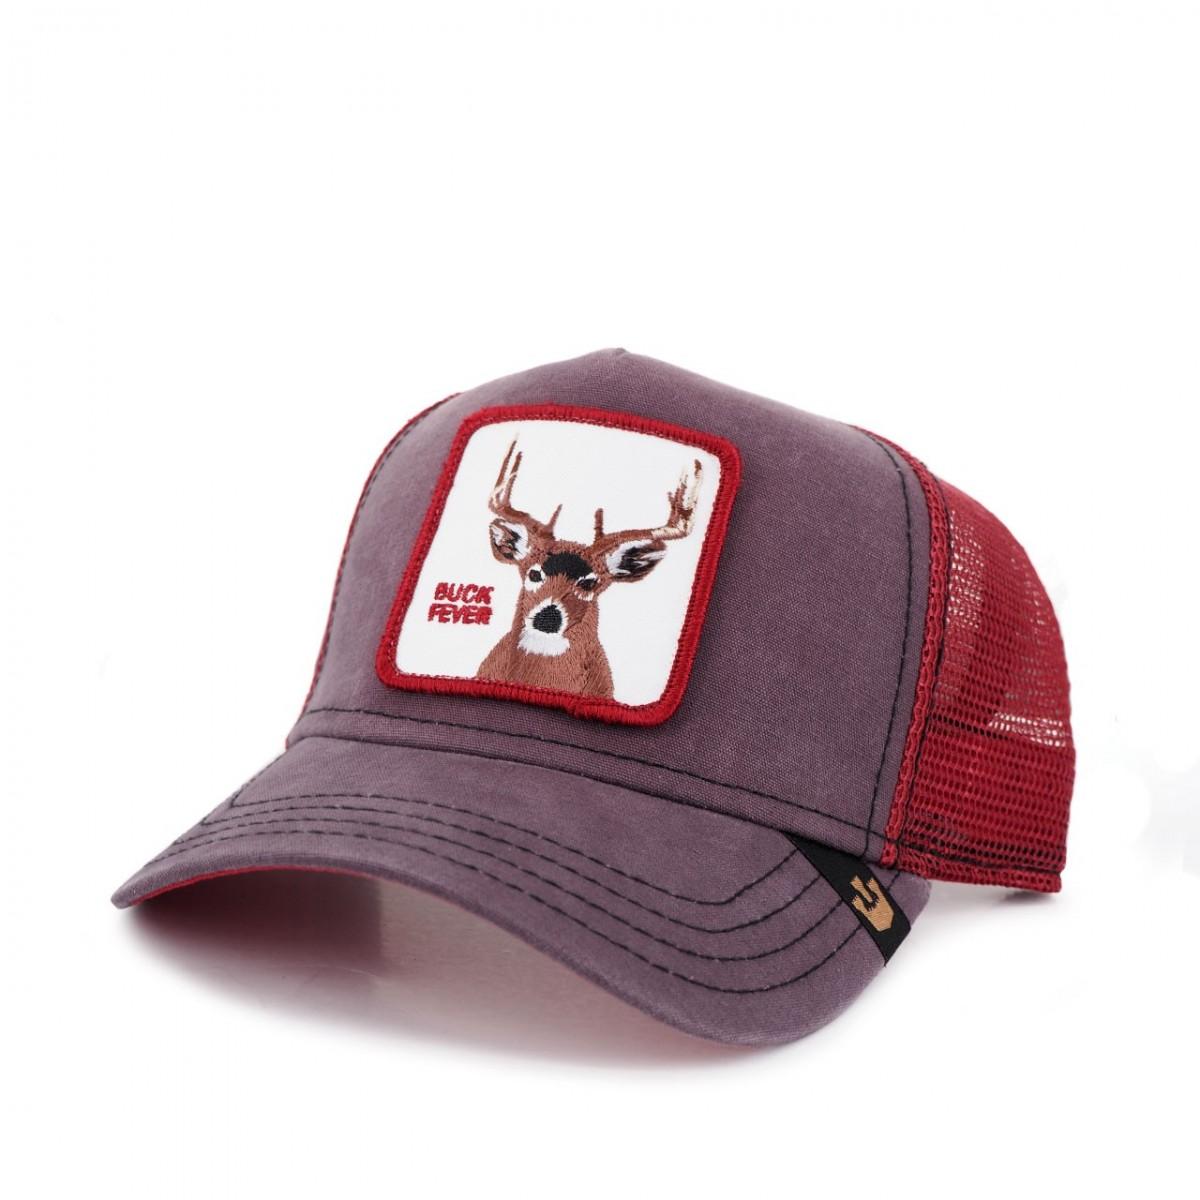 b3489ca6af6 Goorin Bros.   Gorra de béisbol de ciervo marrón   GOB_101-2748-BRO